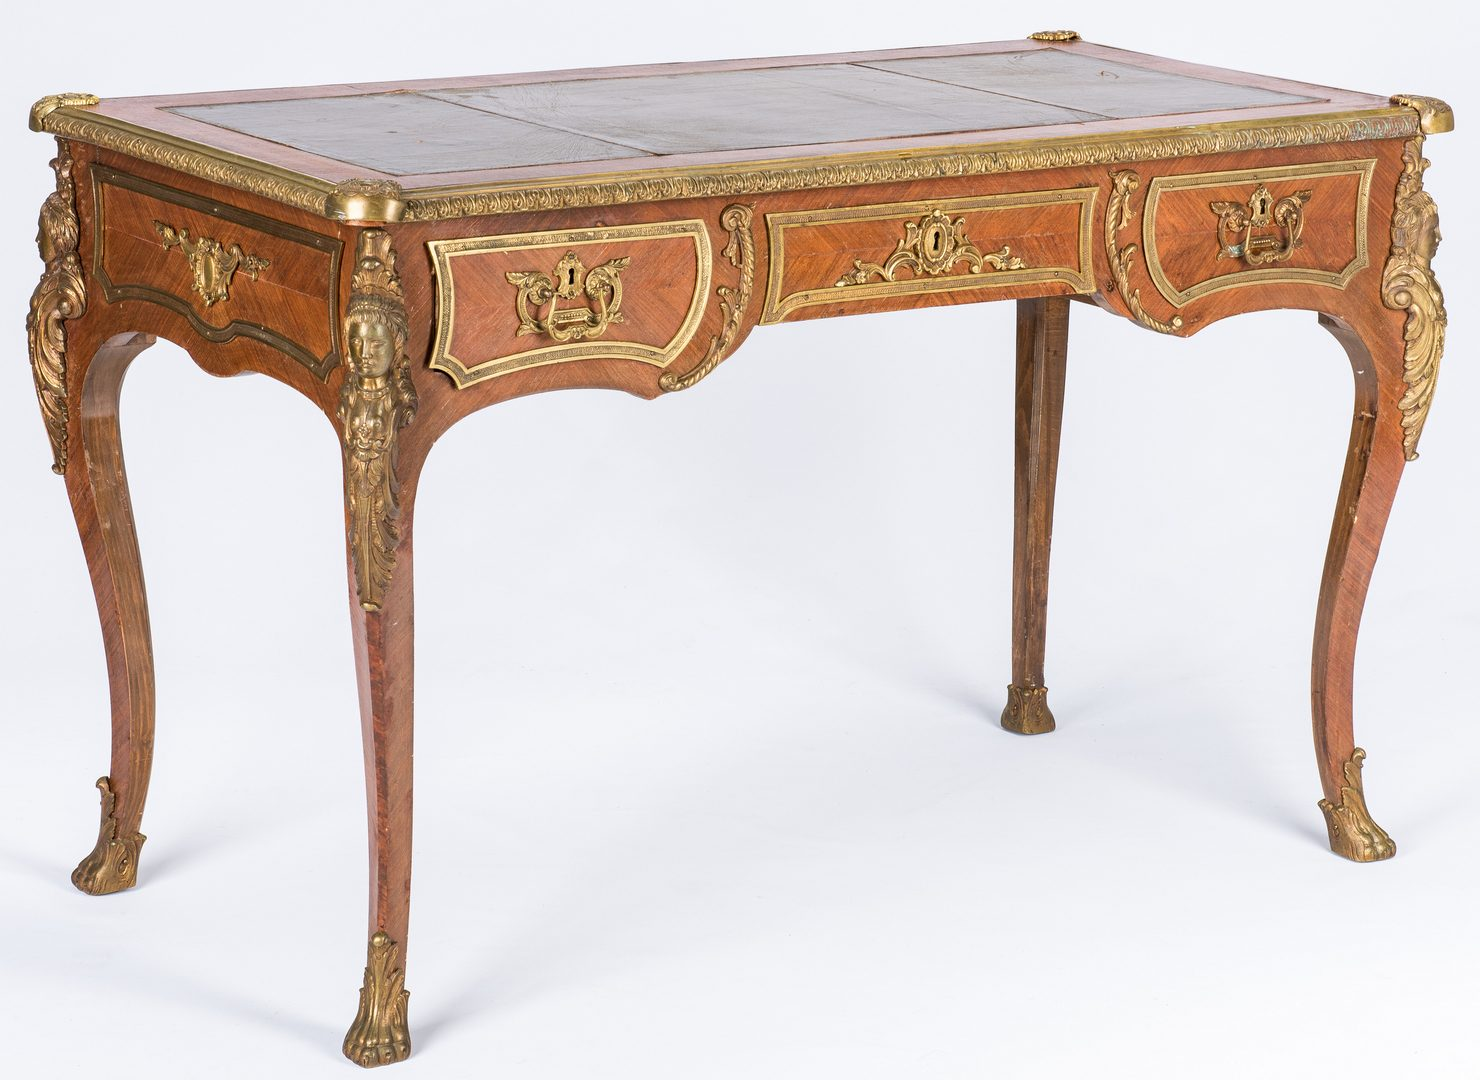 Lot 386: Louis XV Style Bureau Plat Desk w/ Bronze Mounts